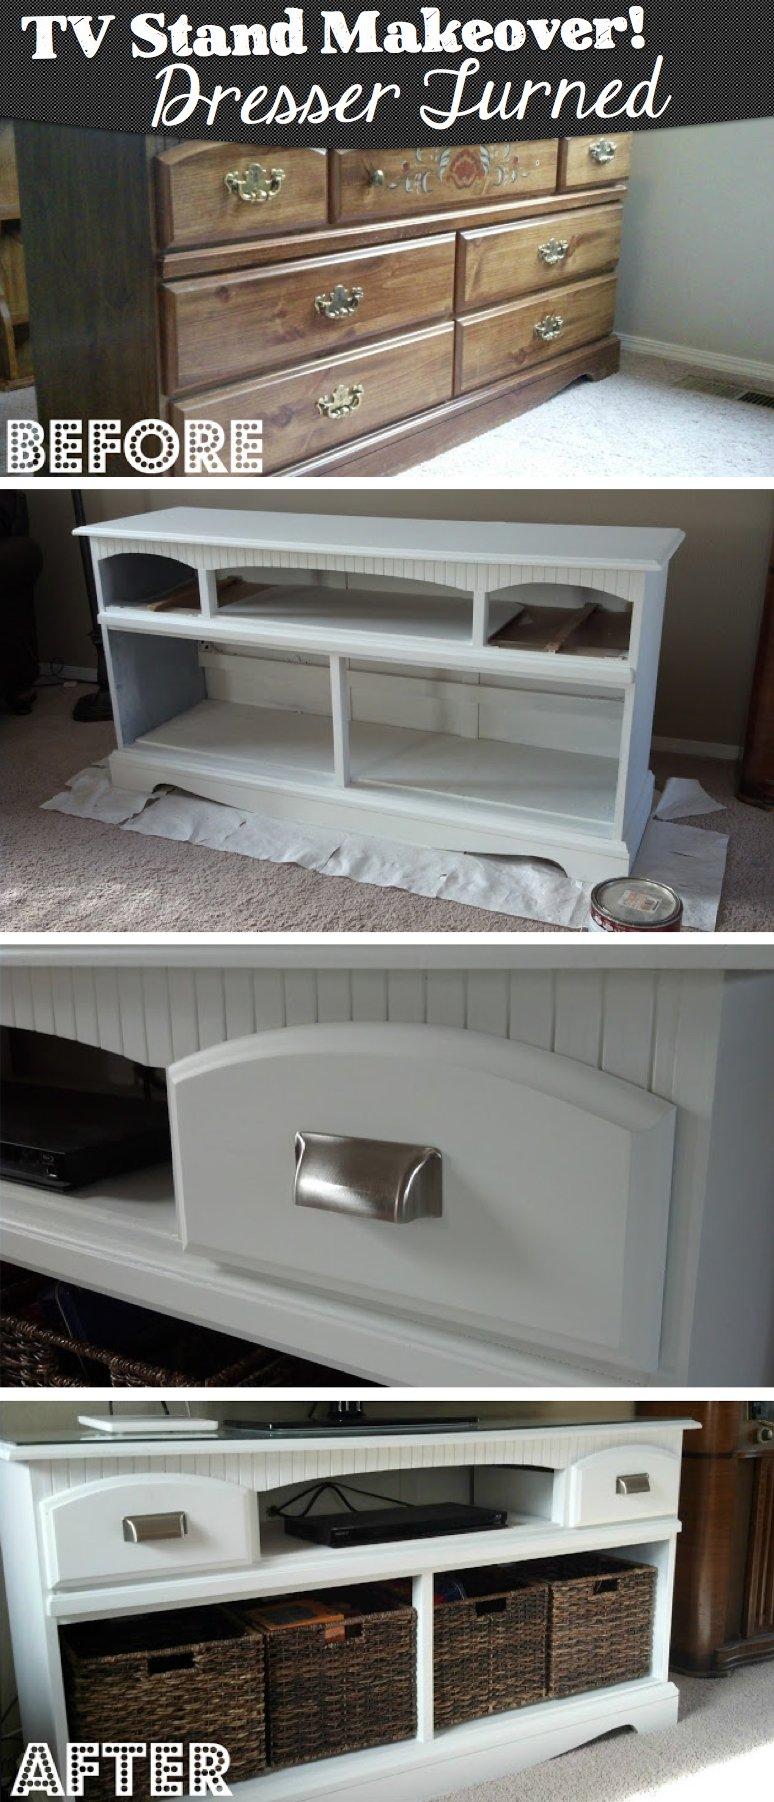 Rustikale Kommode selber machen-Alte Möbel erneuern-DIY Bastelidee